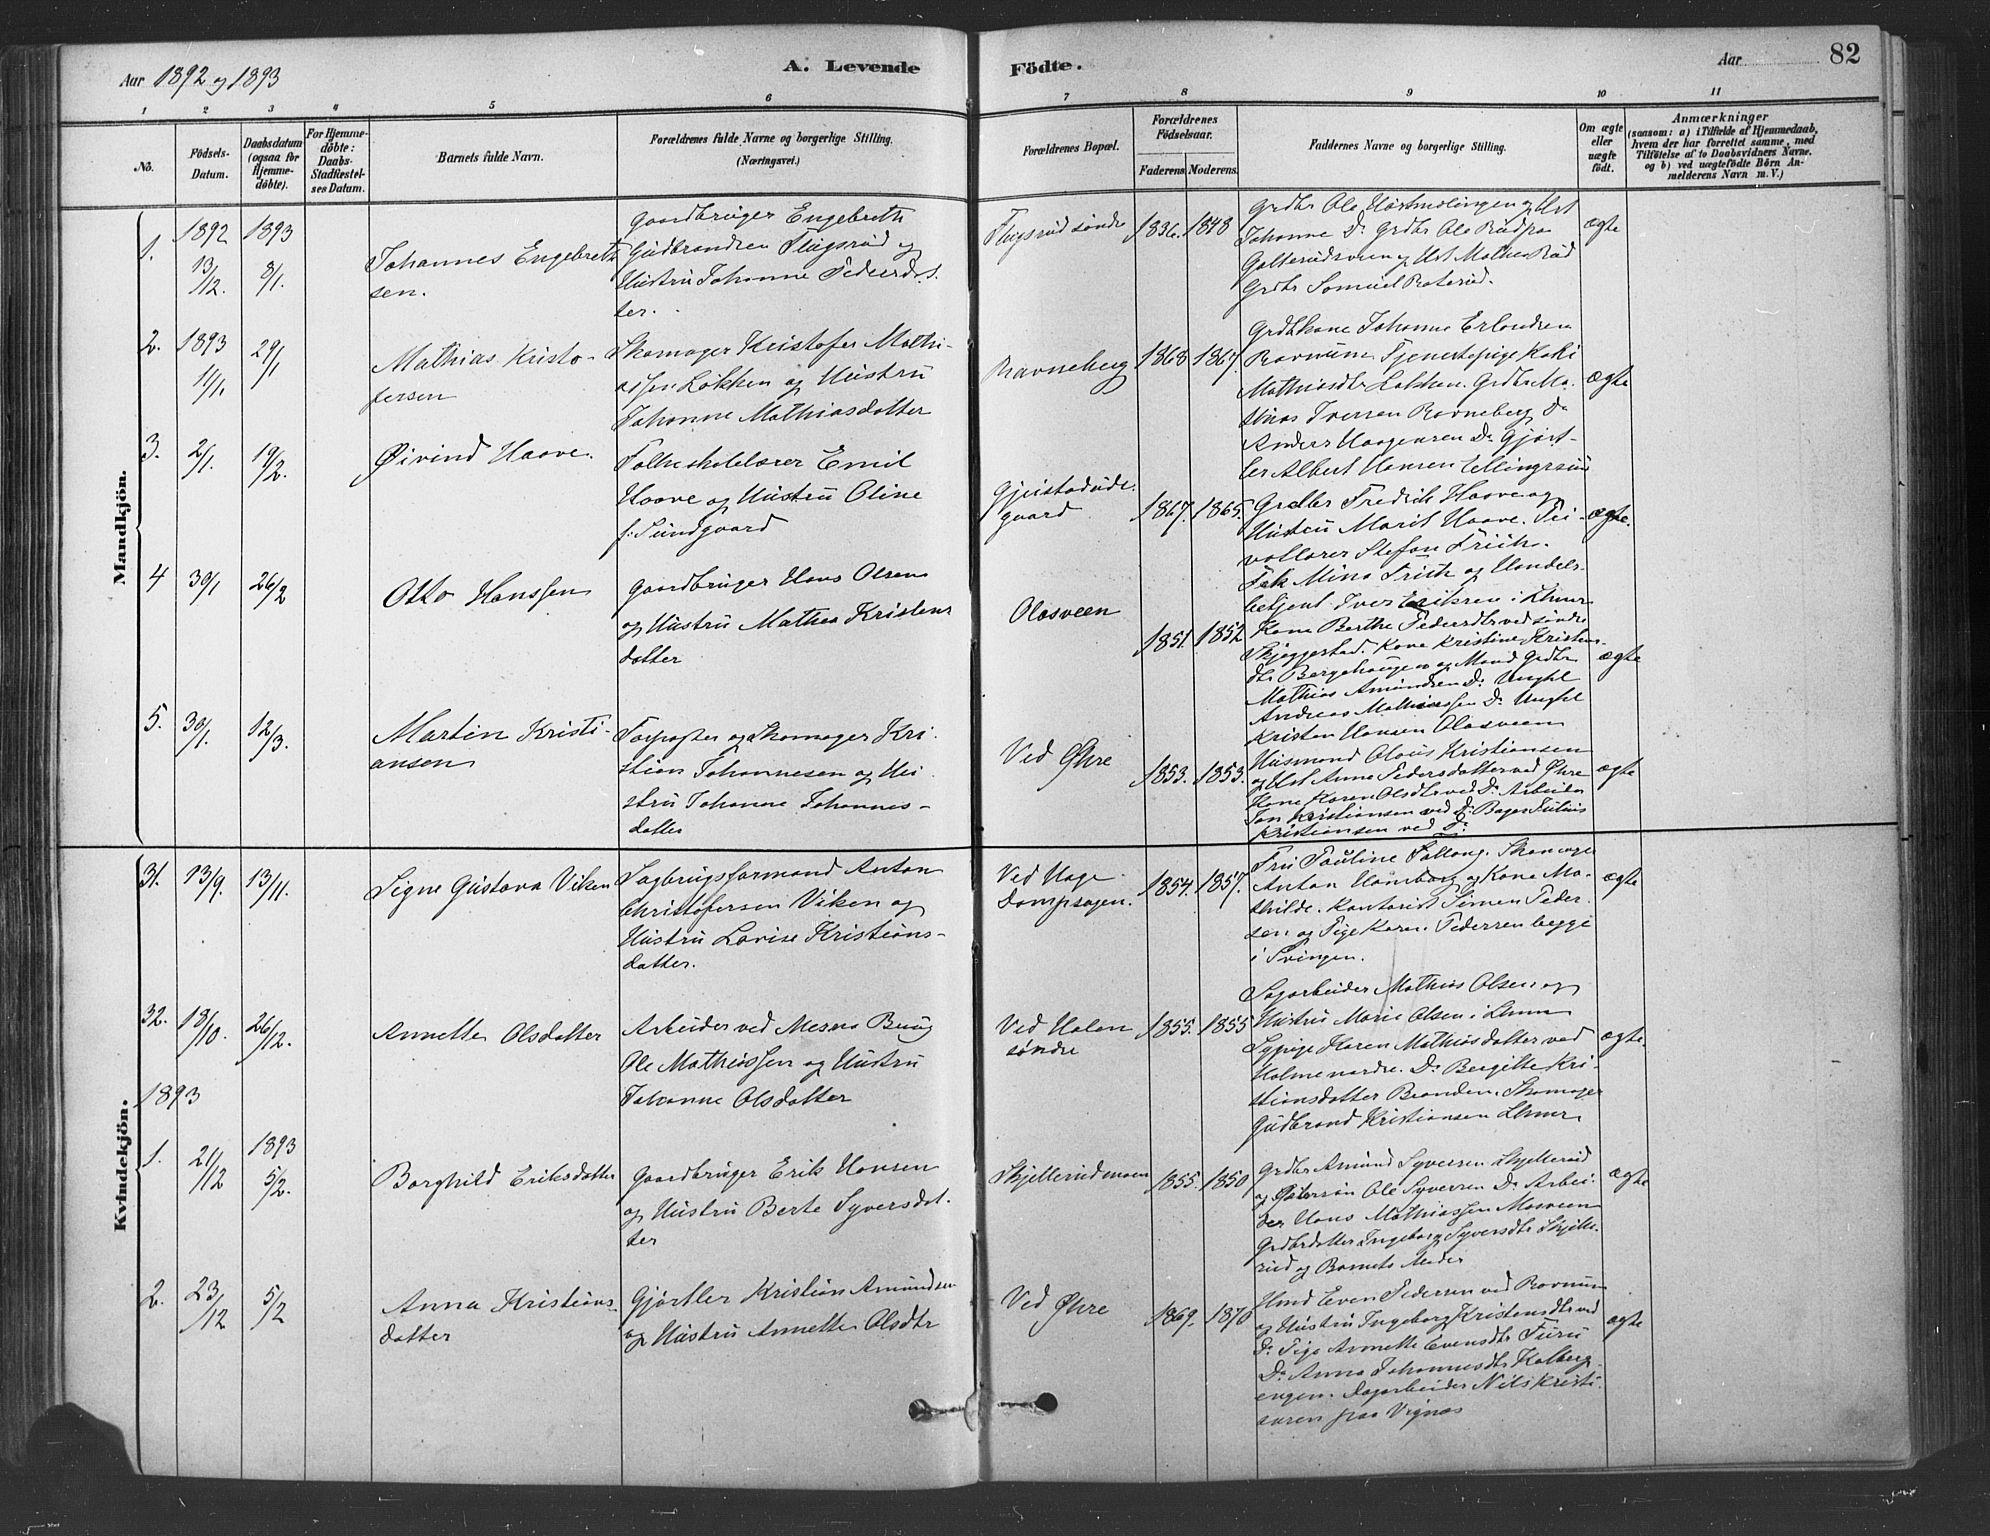 SAH, Fåberg prestekontor, Ministerialbok nr. 9, 1879-1898, s. 82